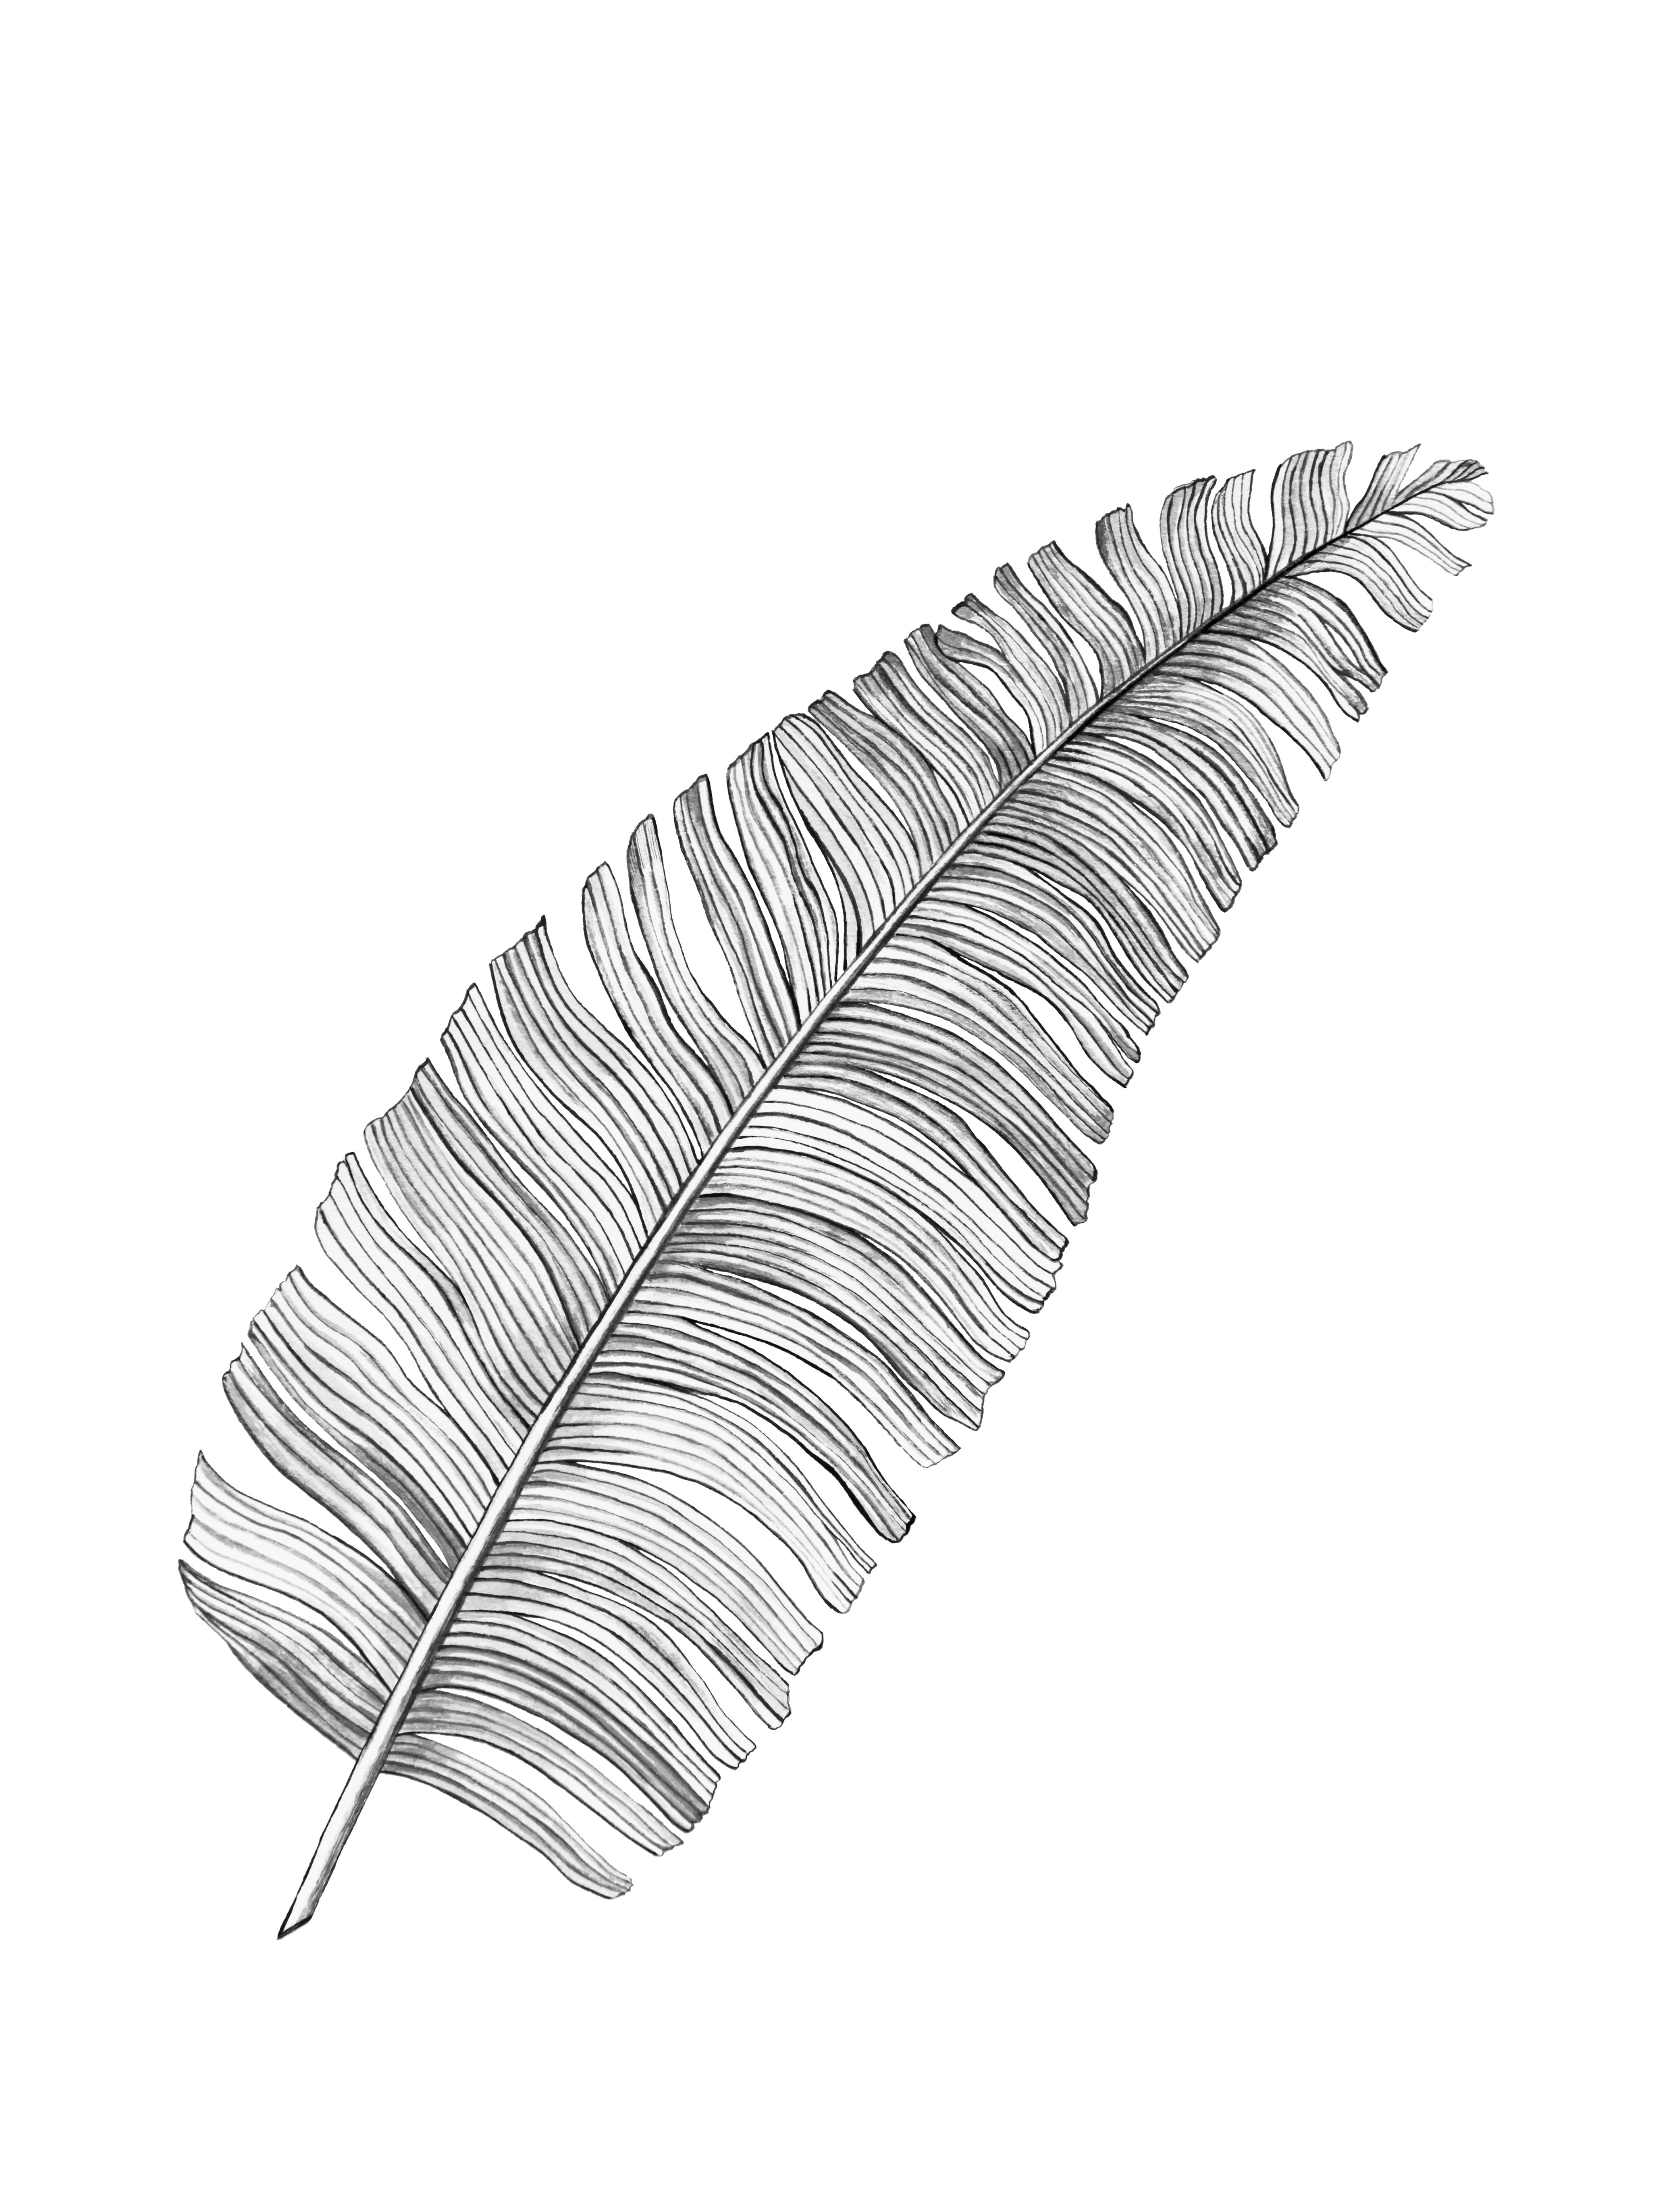 Fotograf Siyah Ve Beyaz Tropikal Yaprak Illustrasyon Cizim